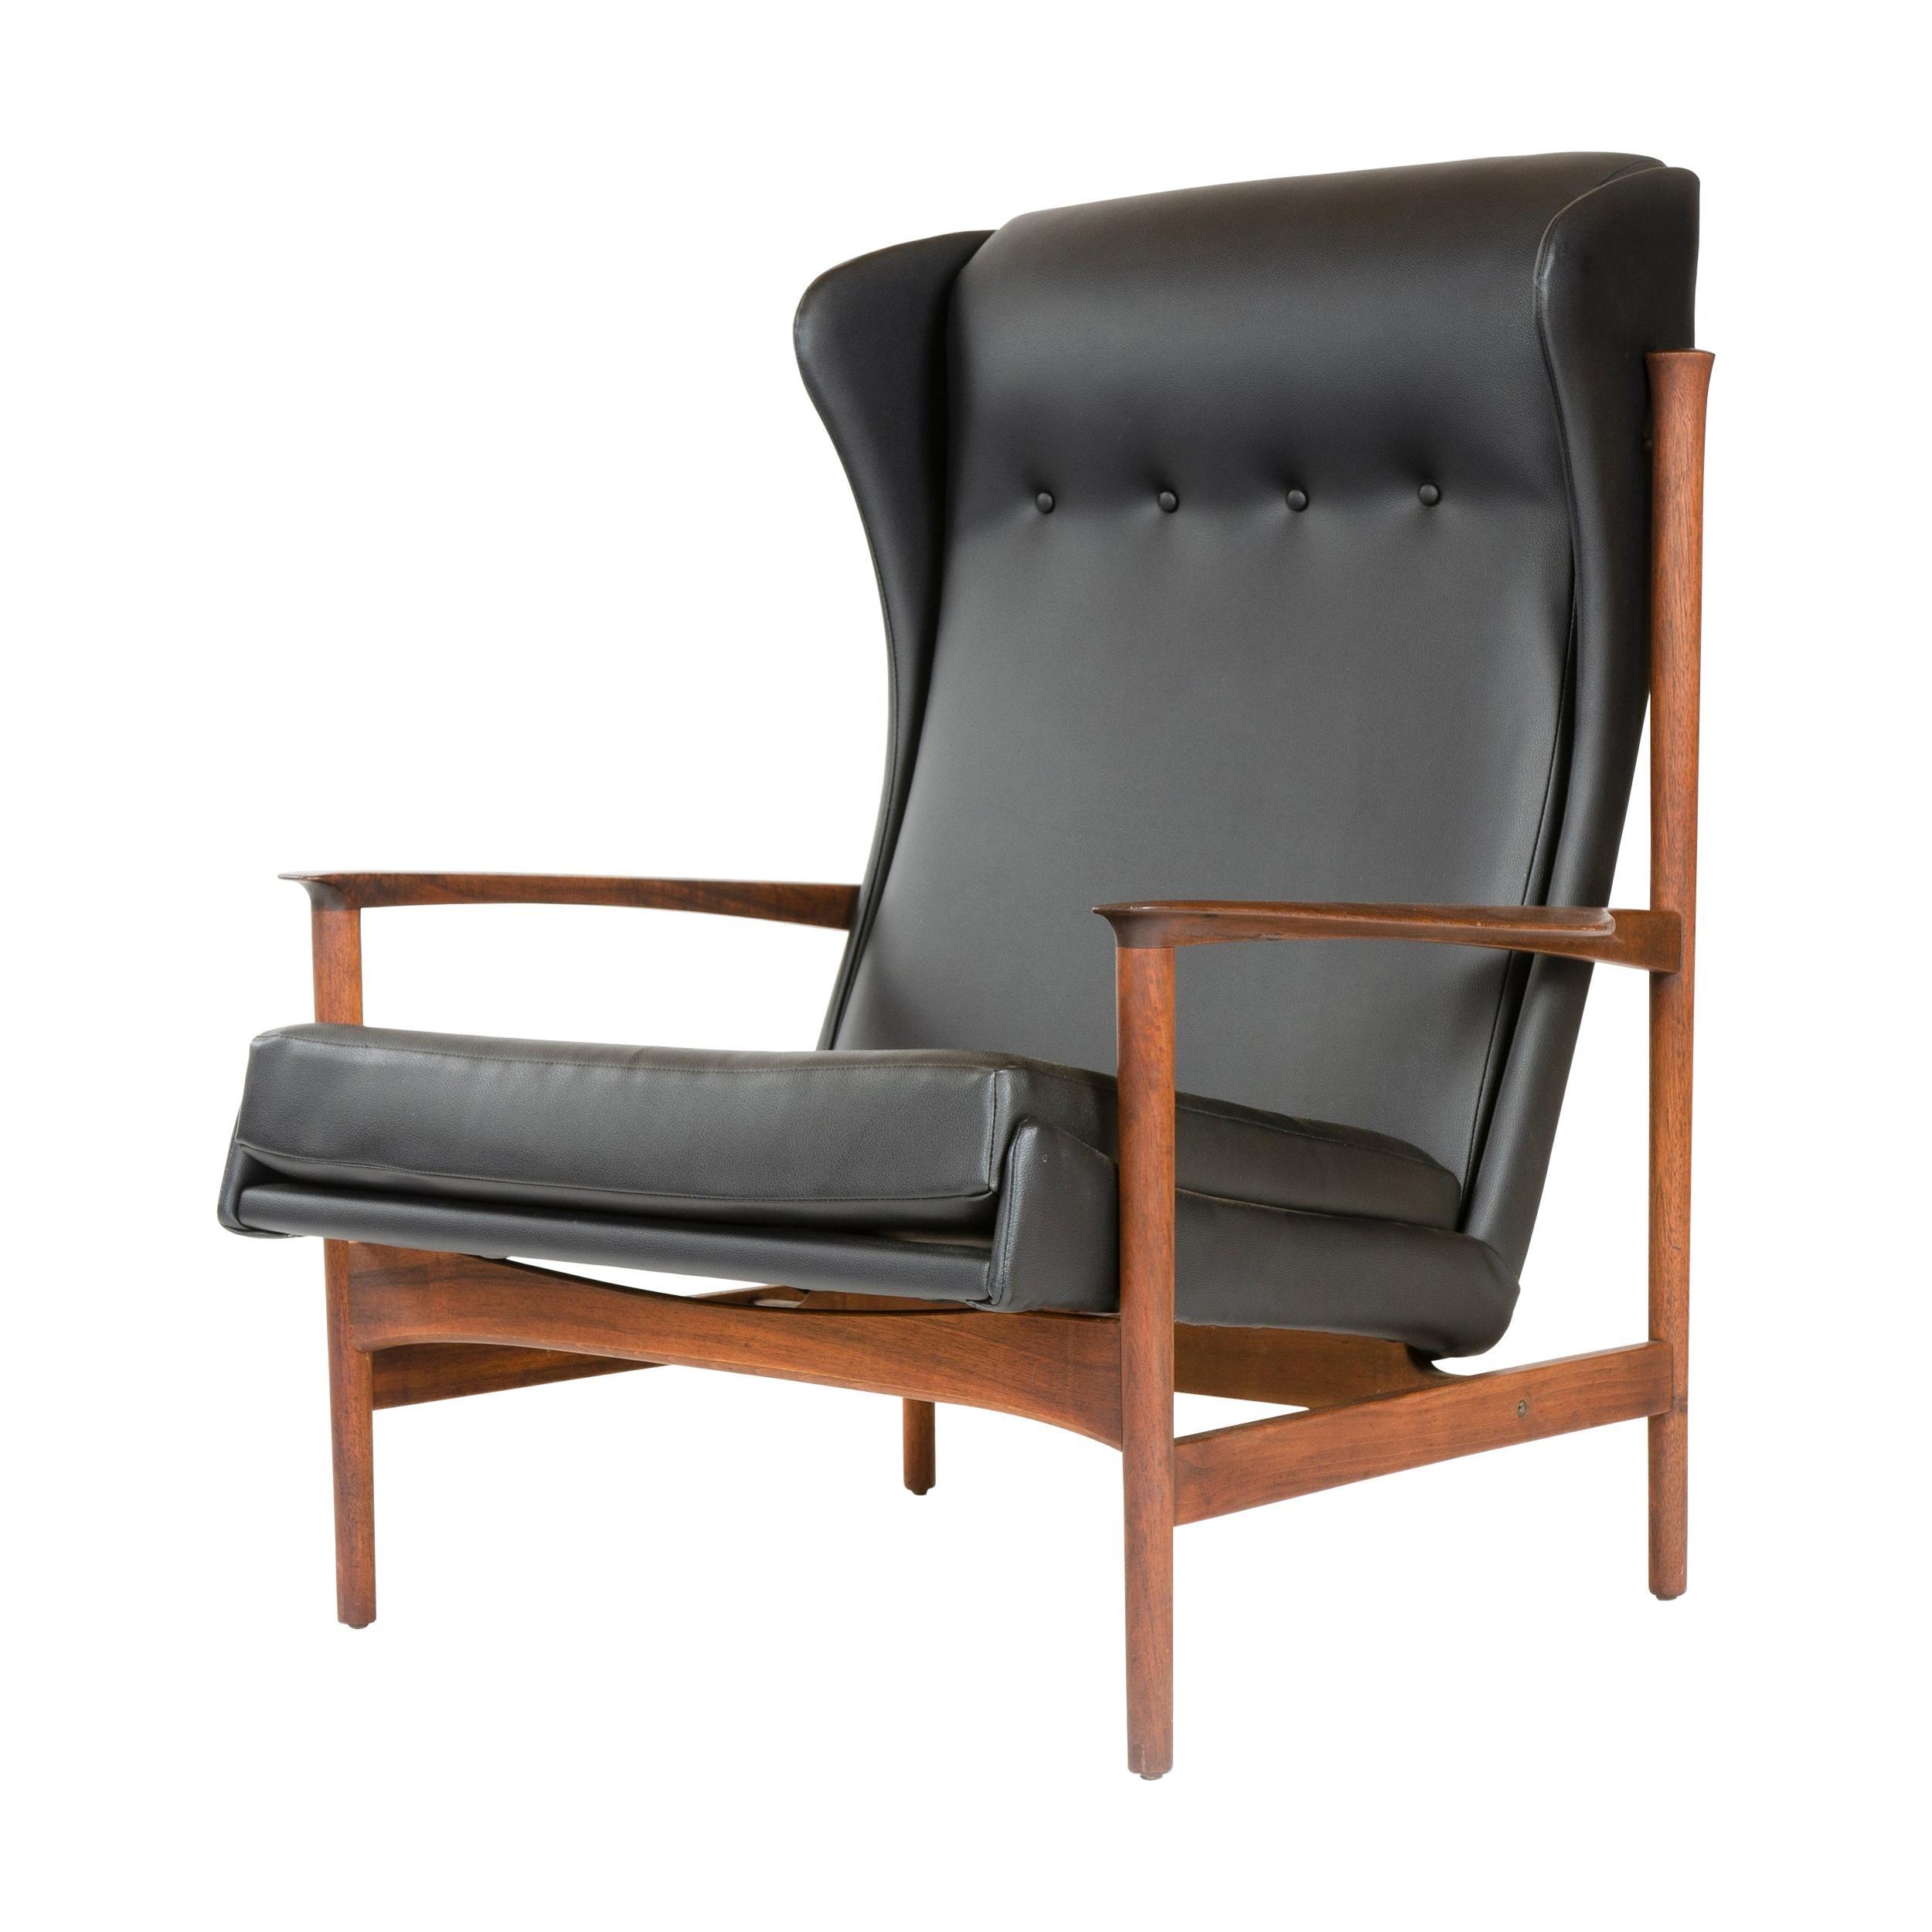 1950s Danish Black Leather Lounge Chair by Ib Kofod Larsen